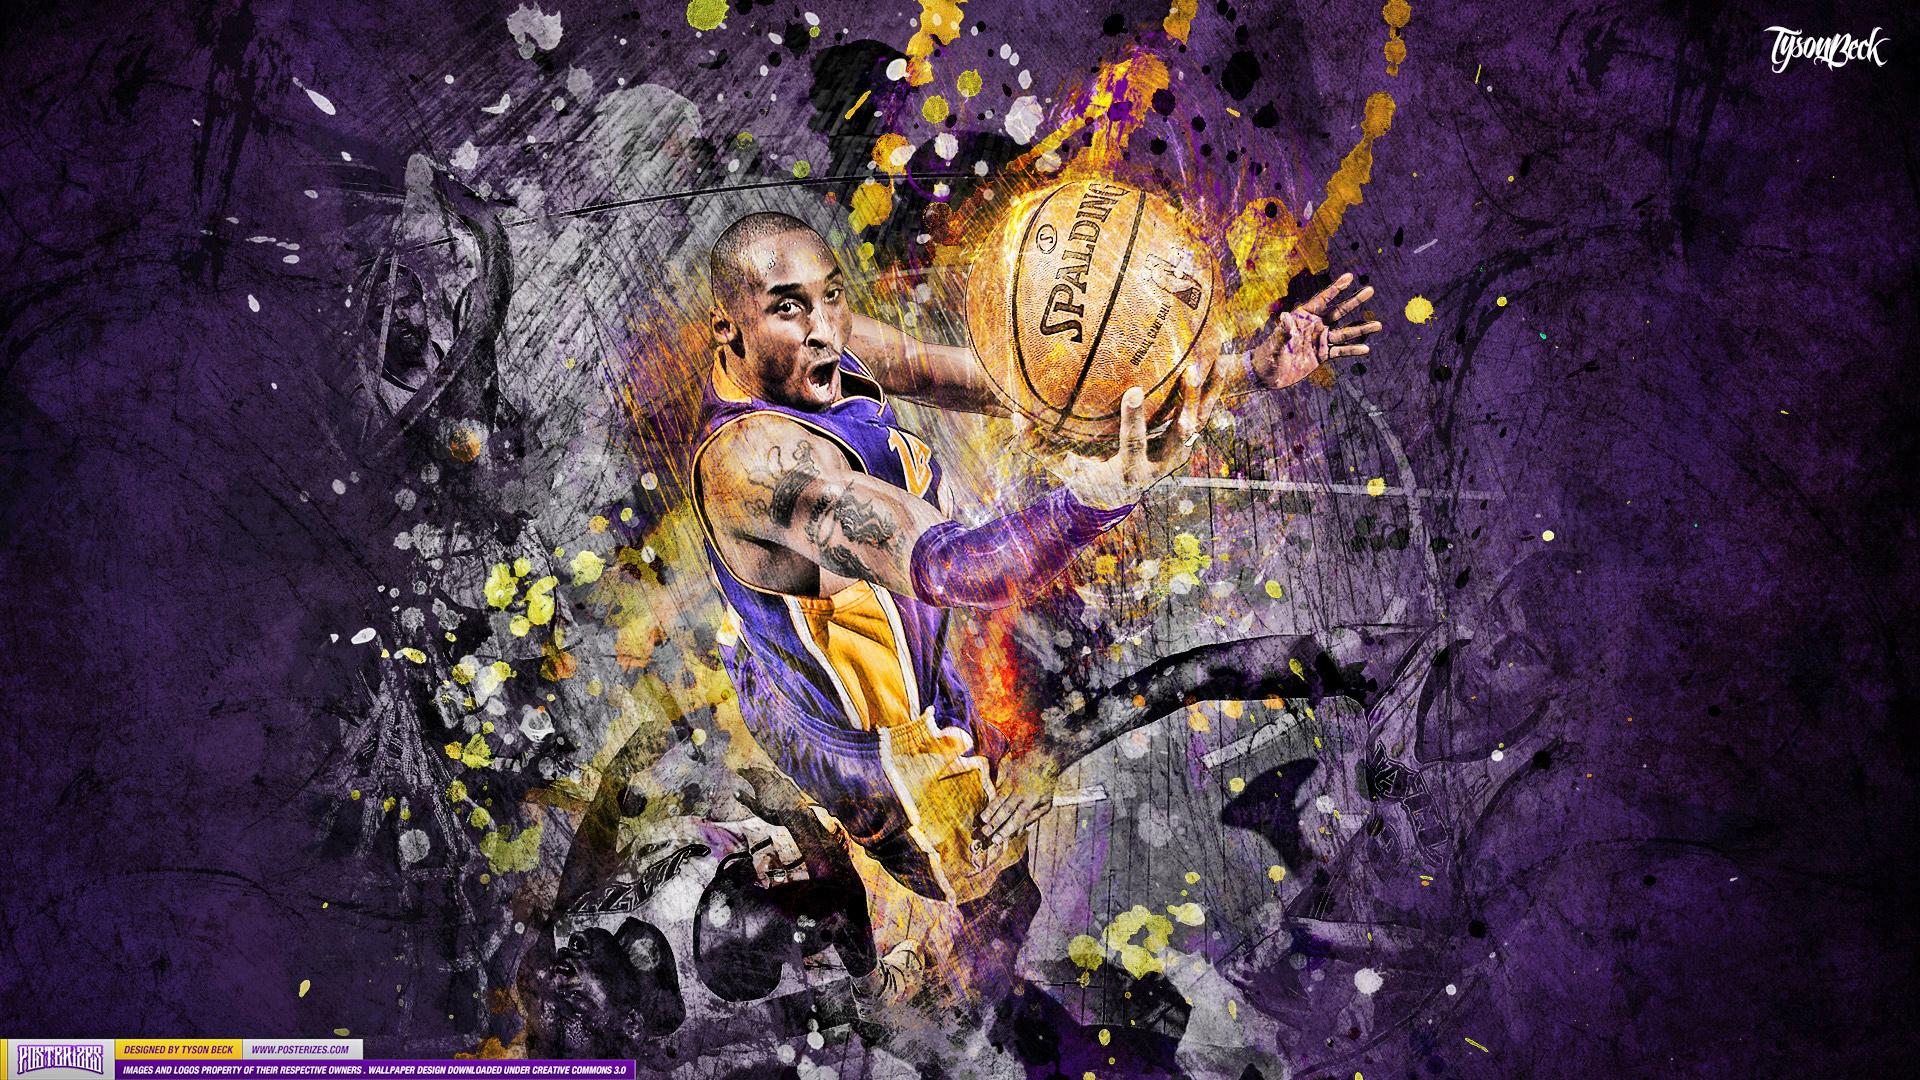 kobe bryant wallpaper lakers wallpapers basketball portfolio 1920x1080 1920x1080